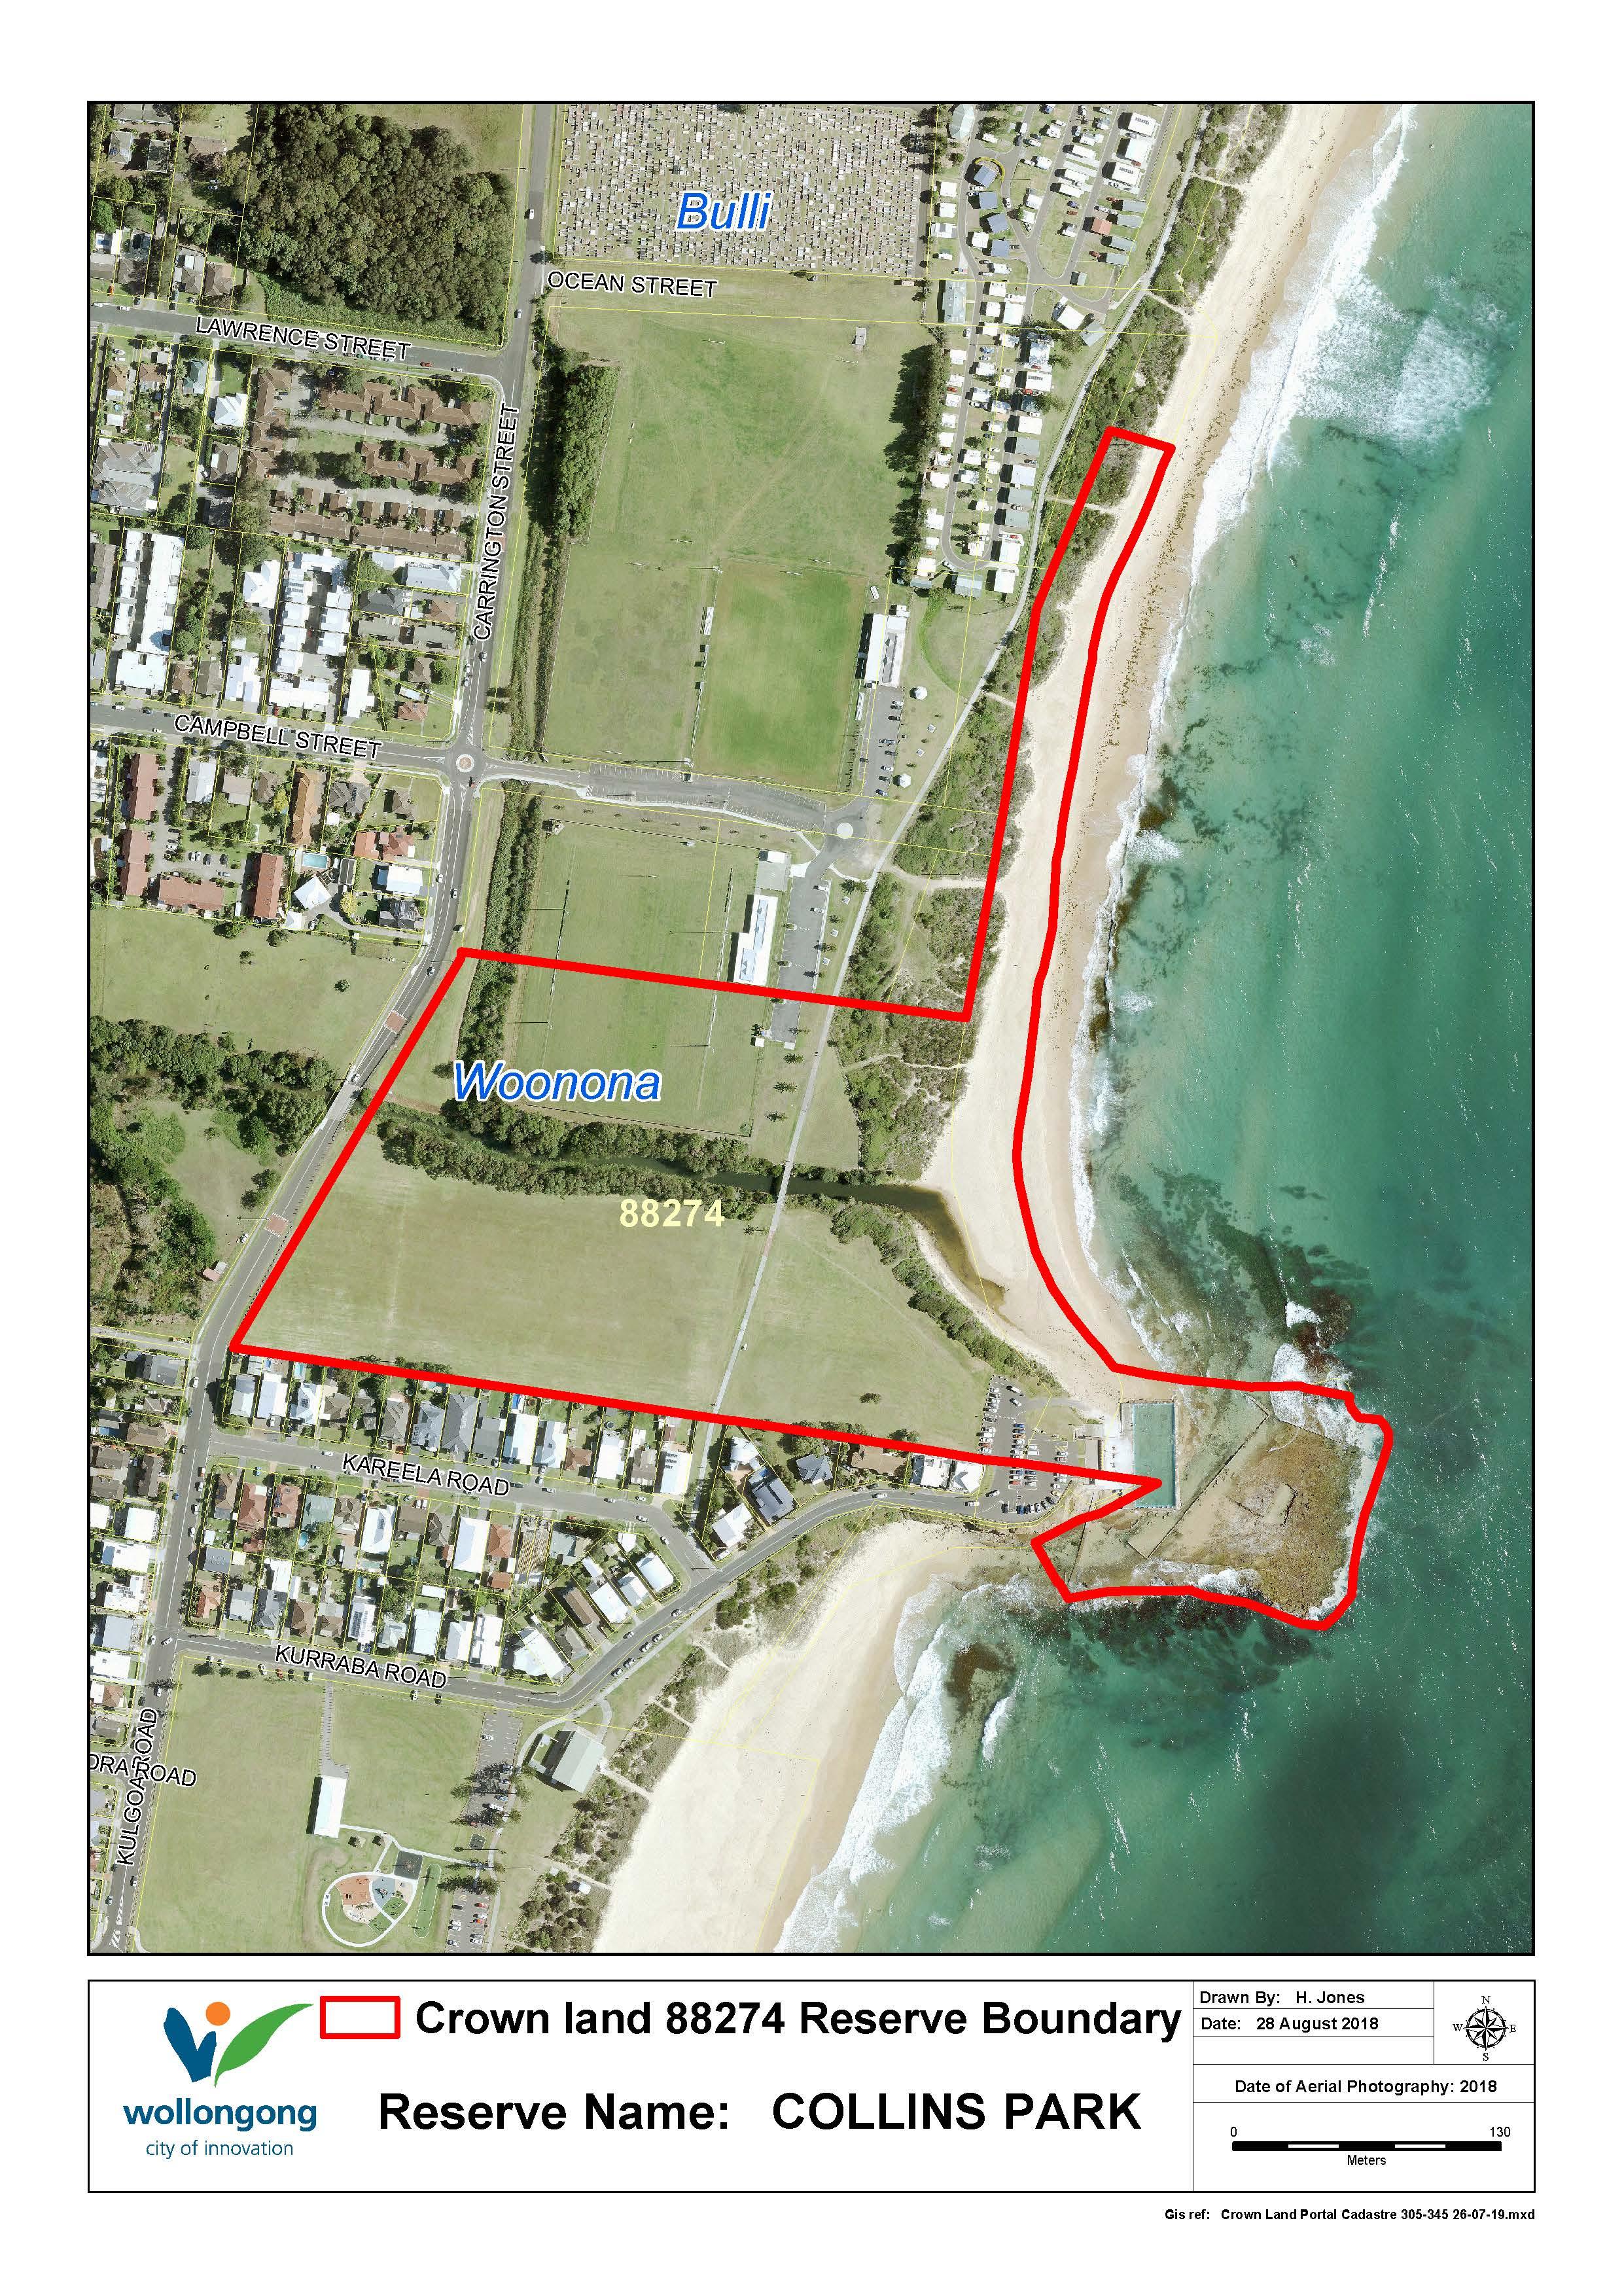 New collins park reserve 88274 map woonona